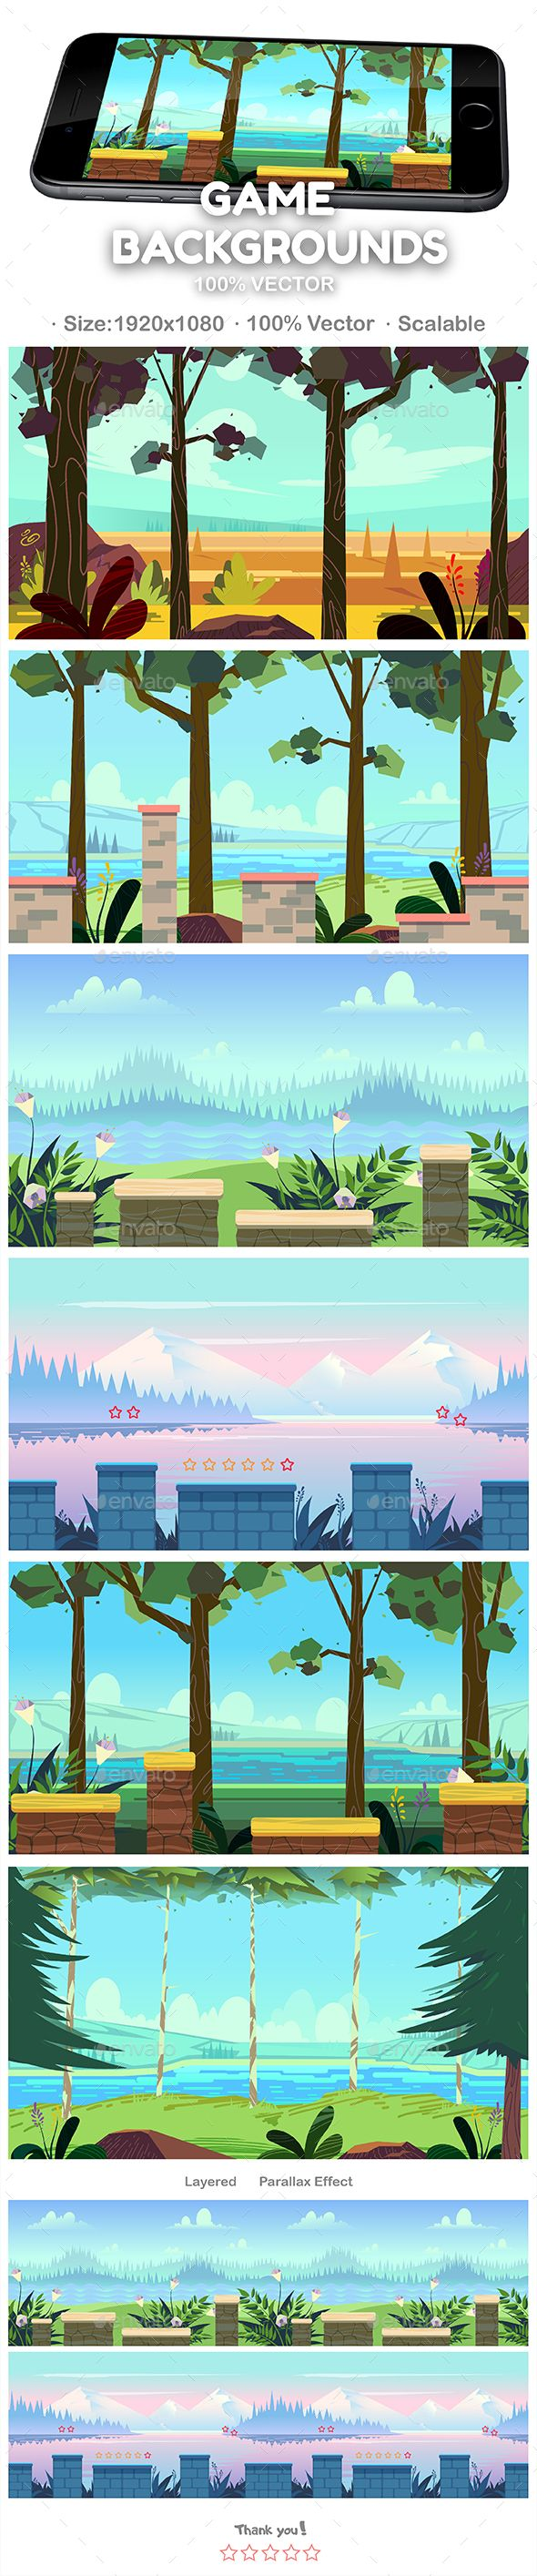 Game Backgrounds Set - #Backgrounds #Game Assets Download here: https://graphicriver.net/item/game-backgrounds-set/20352944?ref=alena994